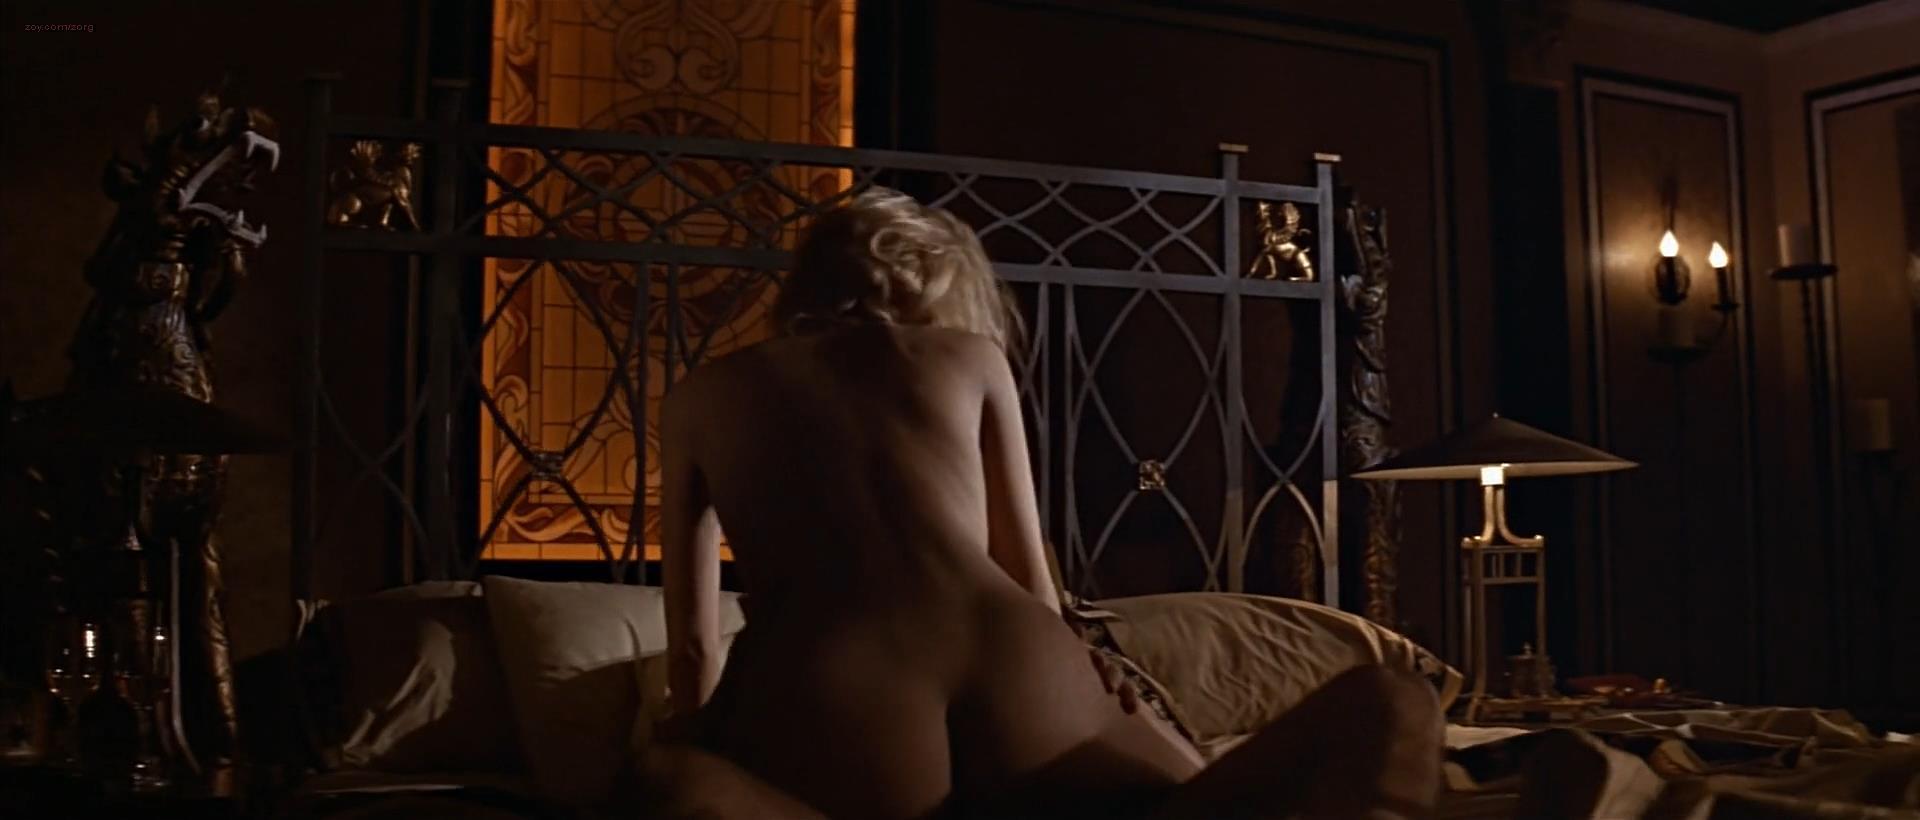 Jeanne tripplehorn nude porn